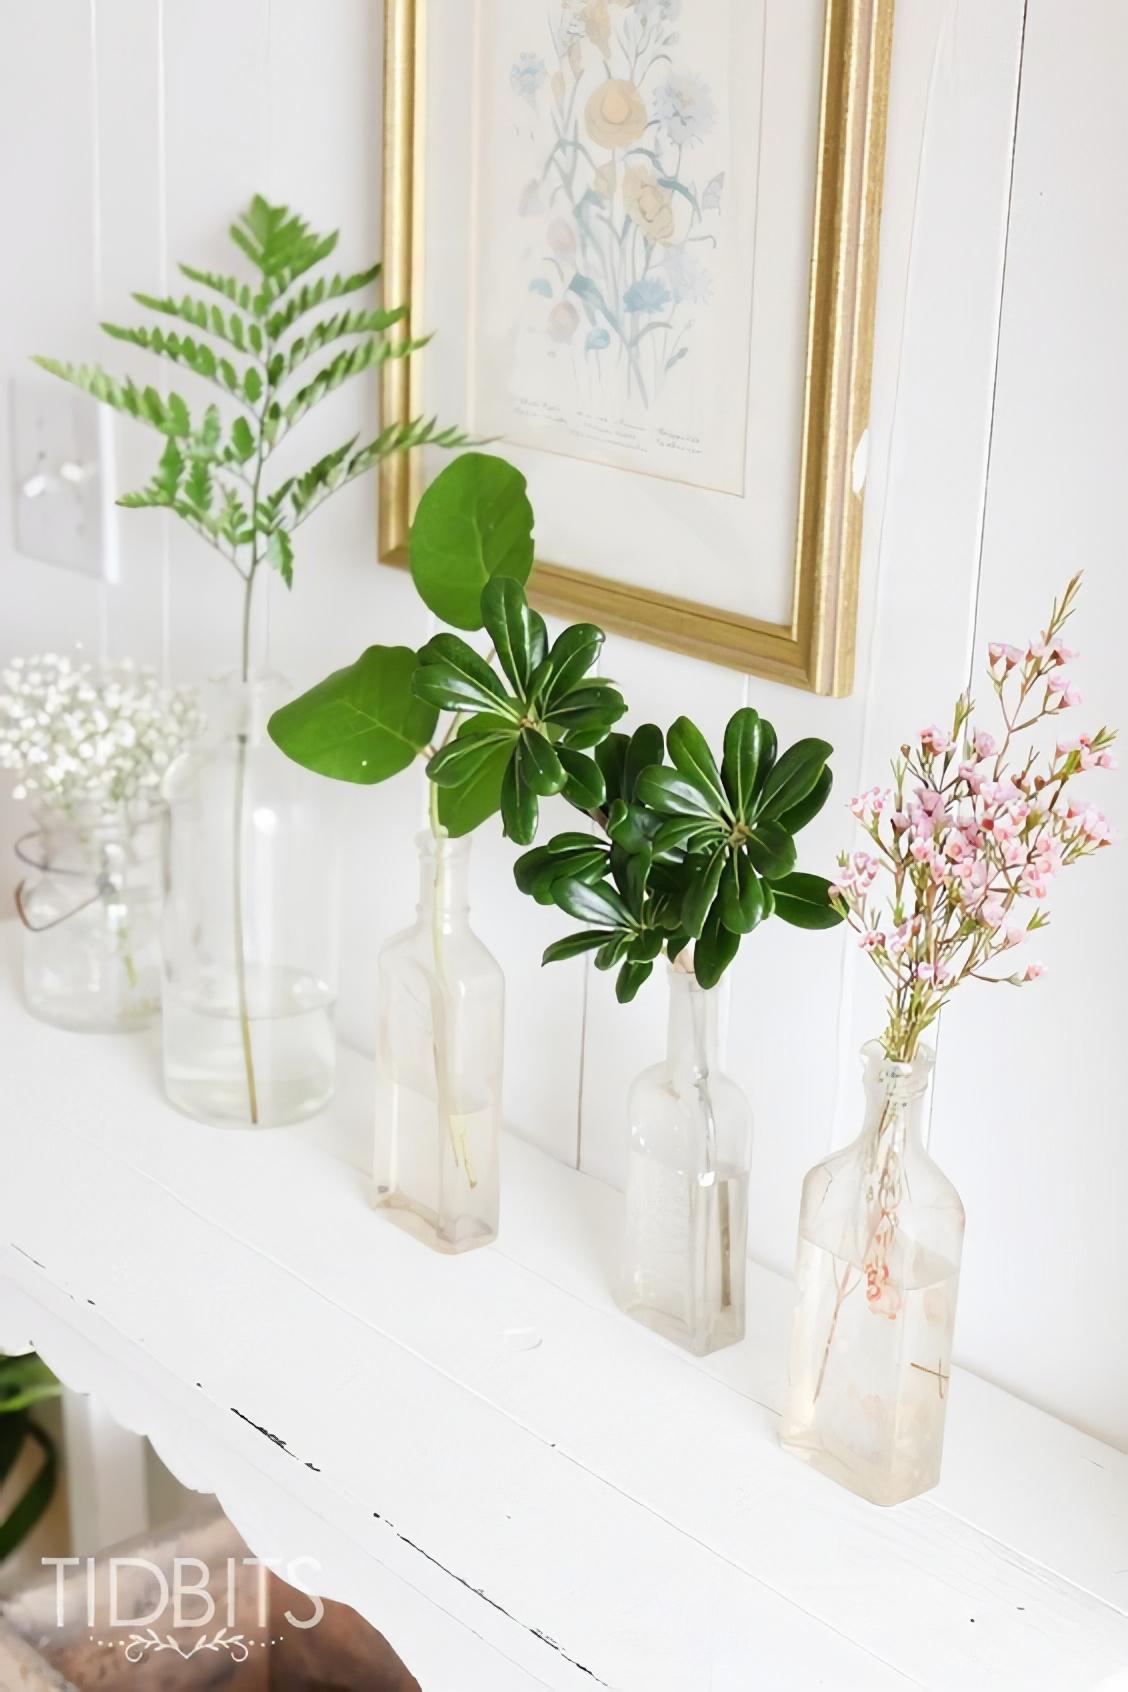 Leatherleaf, Salal, Pittosporum, and Waxflower on a white shelf